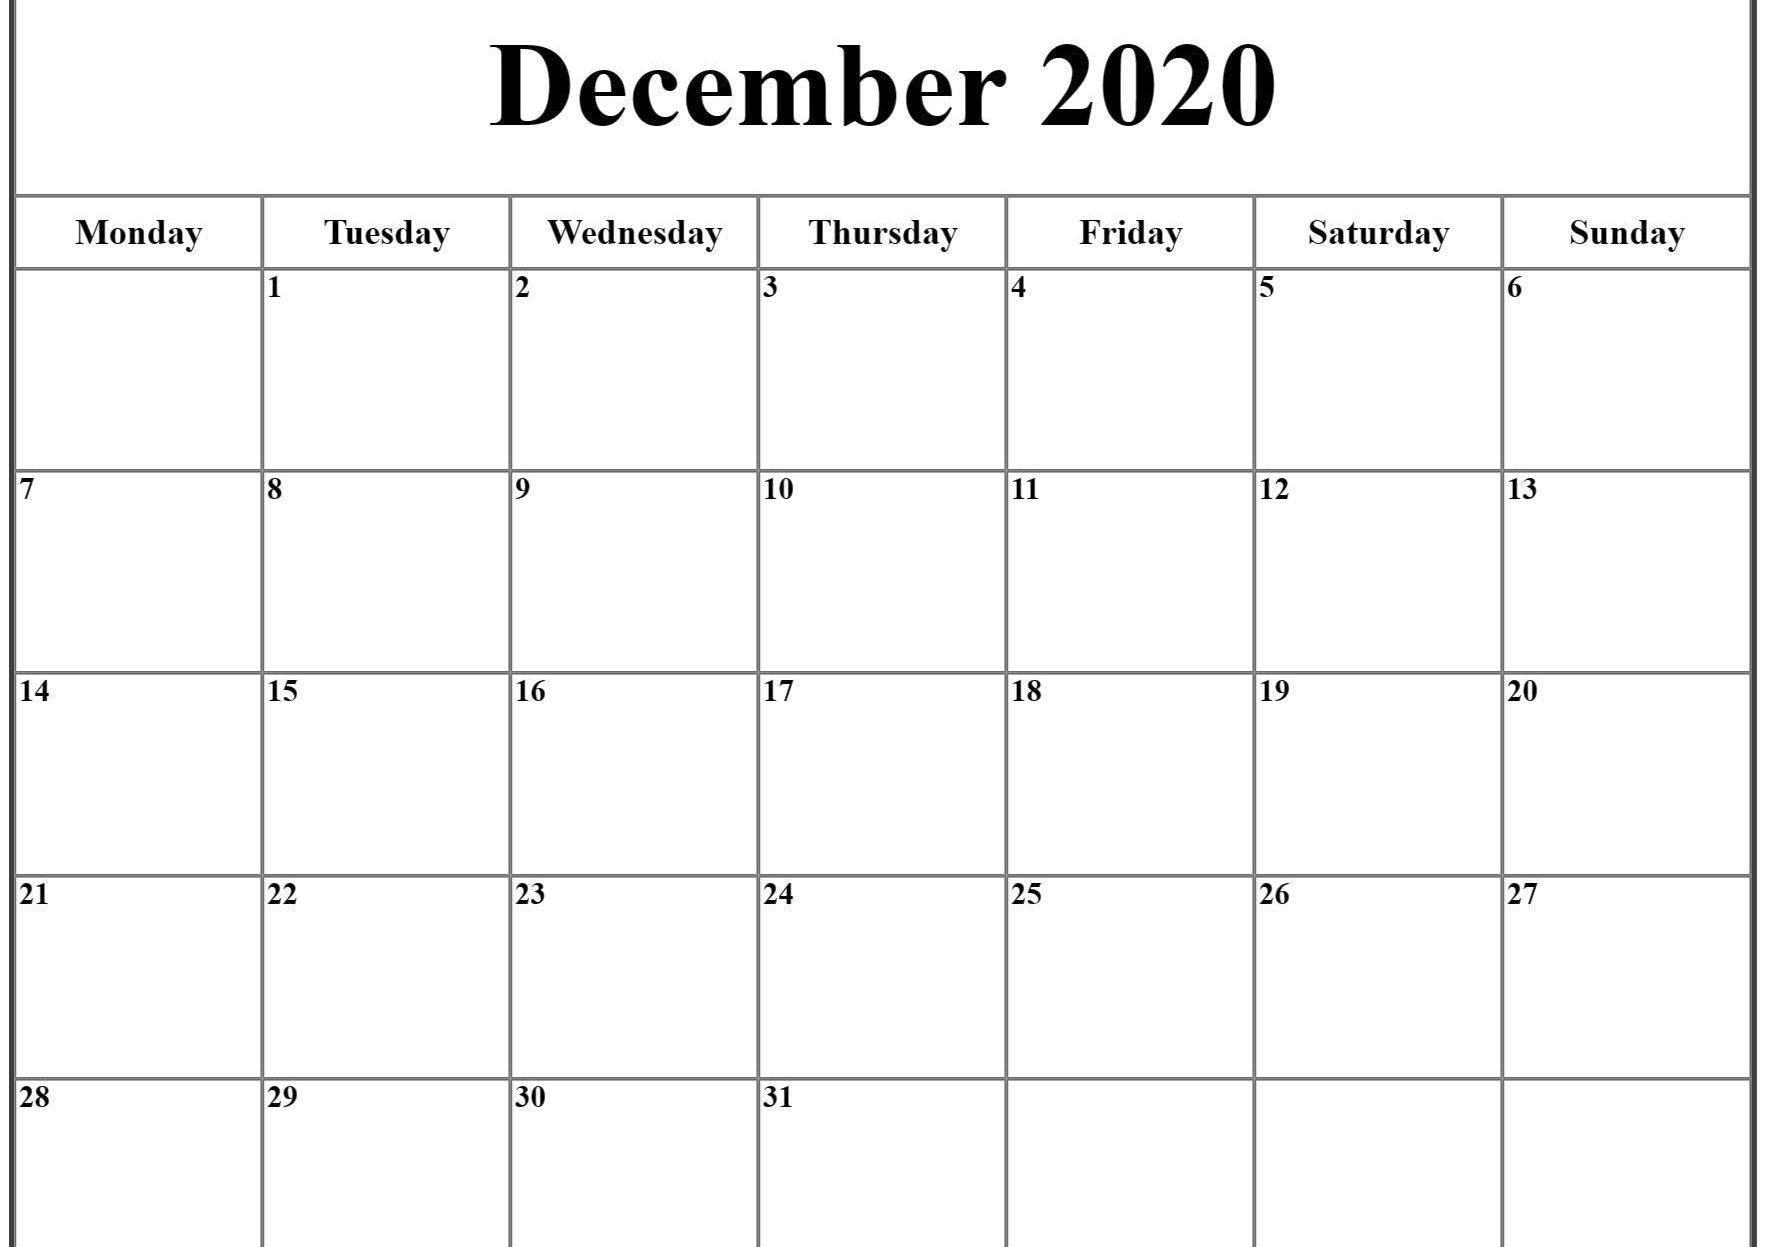 December 2020 Calendar Excel   December Calendar, Printable